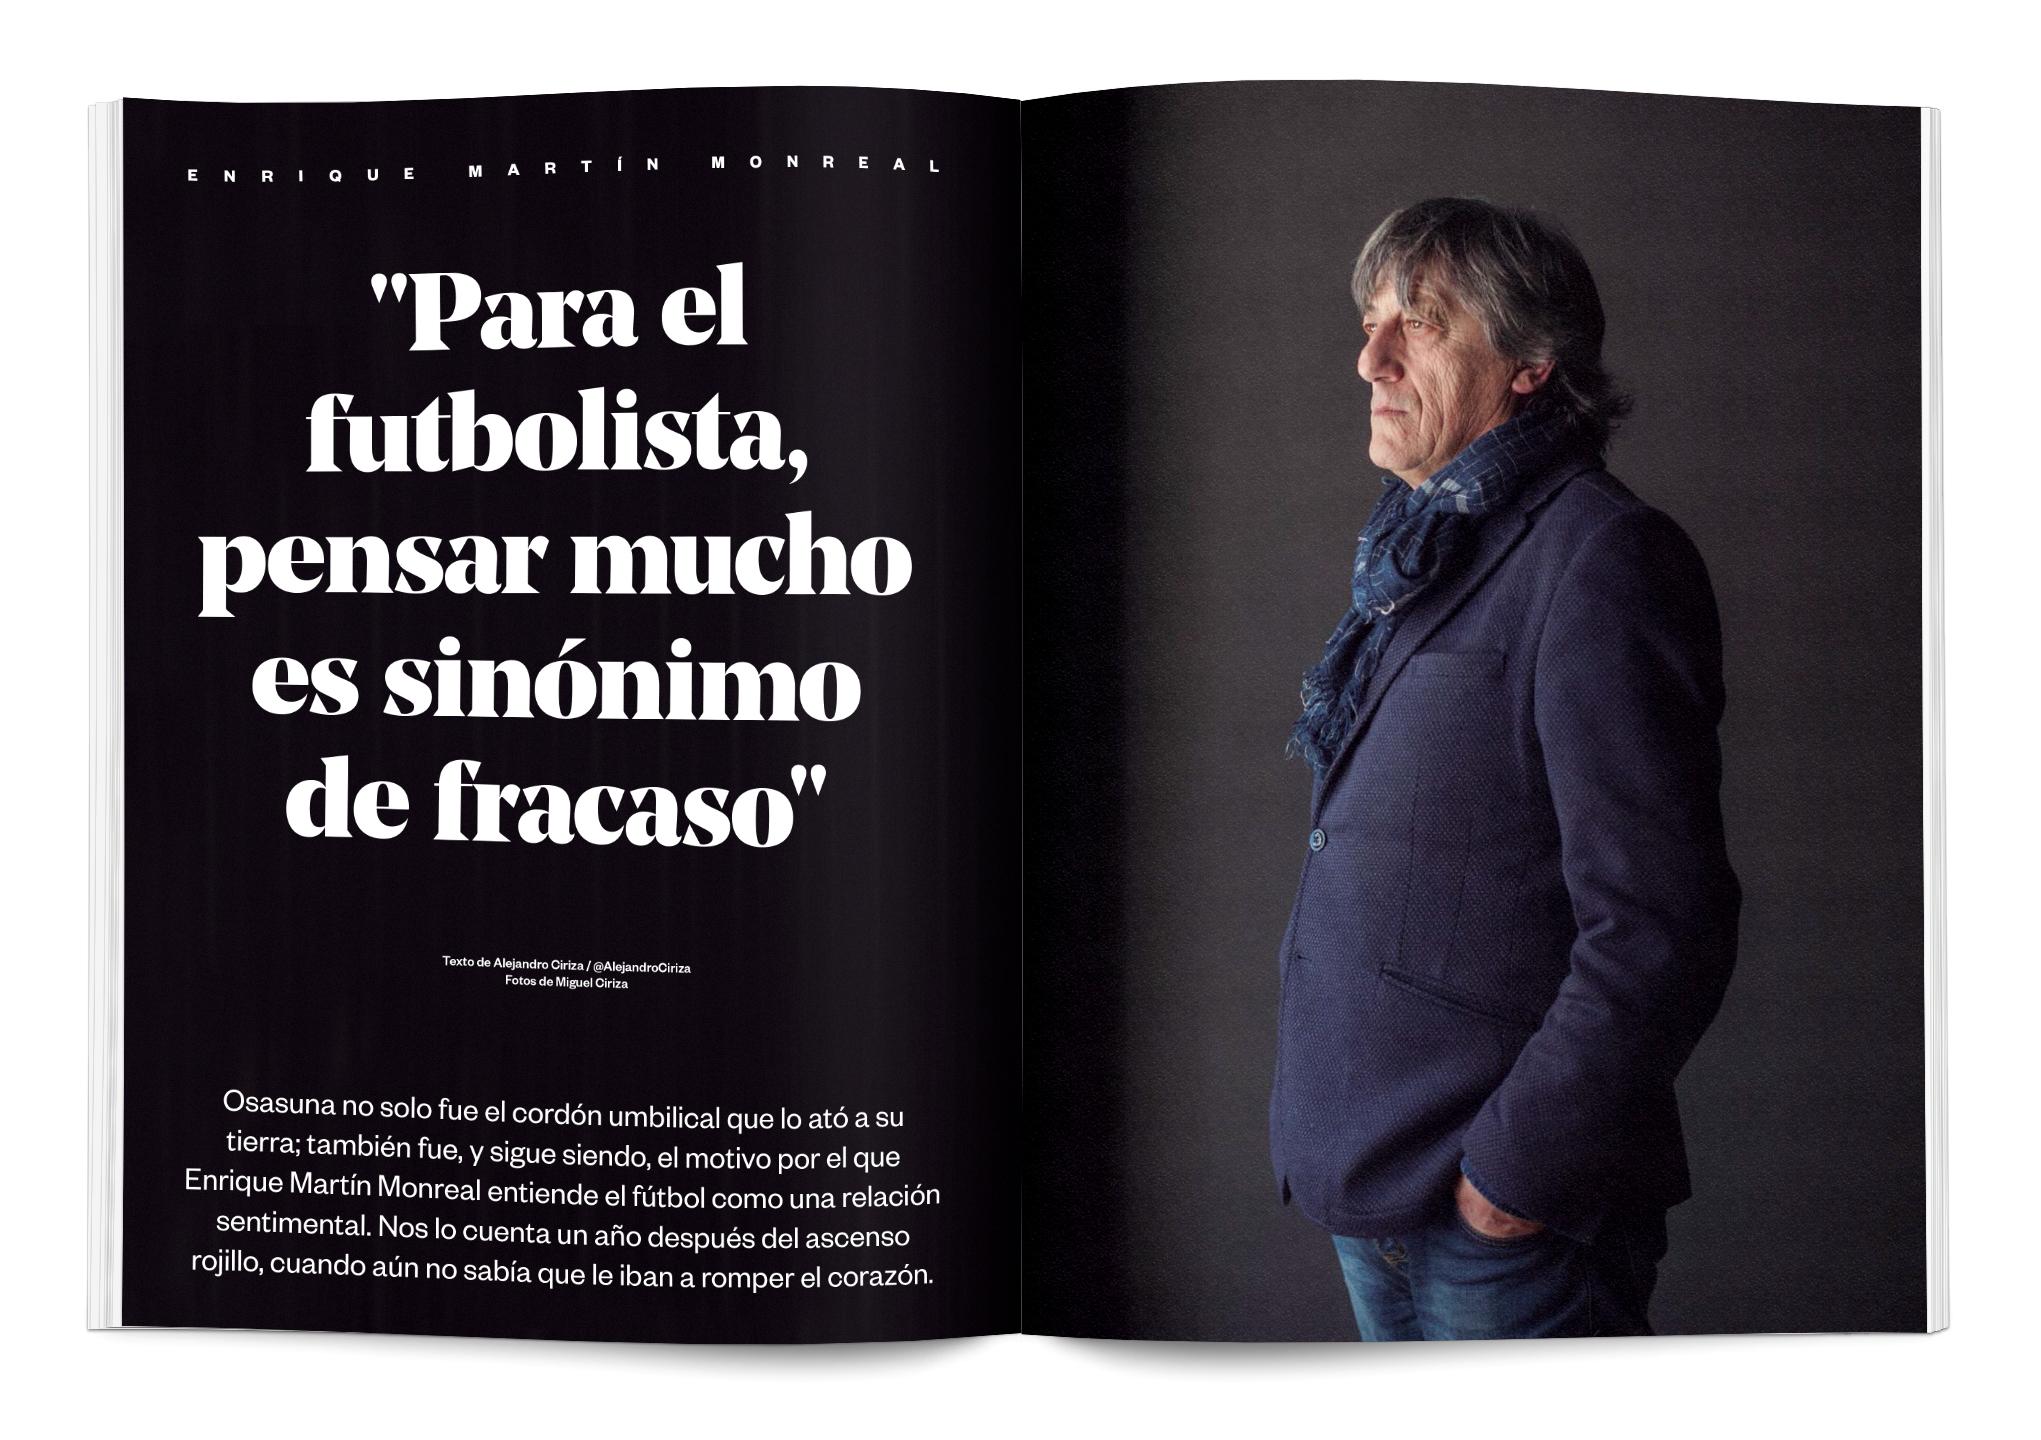 Martín Monreal entrevista